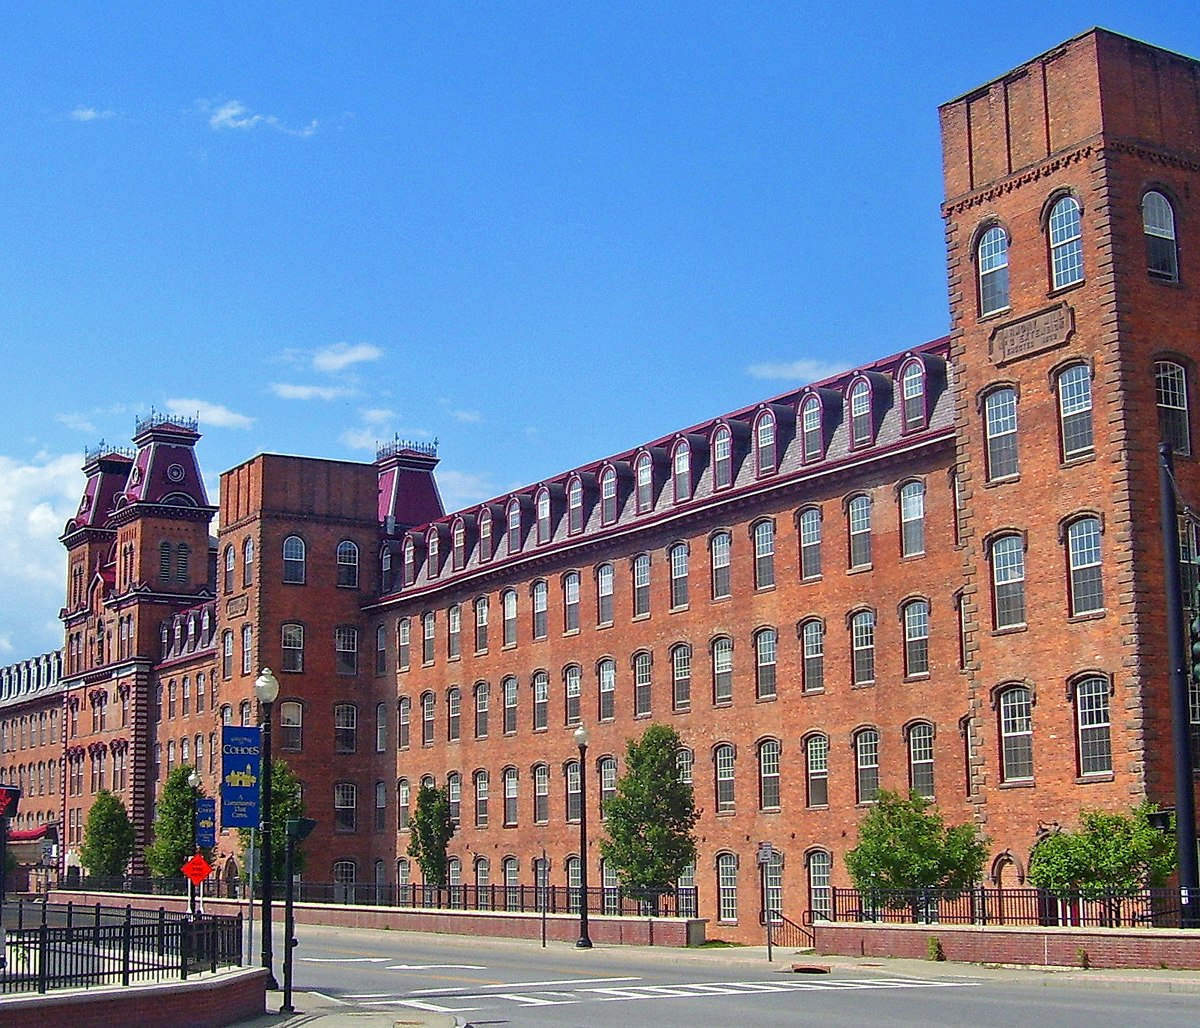 cohoes ny mills harmony york restore file wikipedia benefit cities program